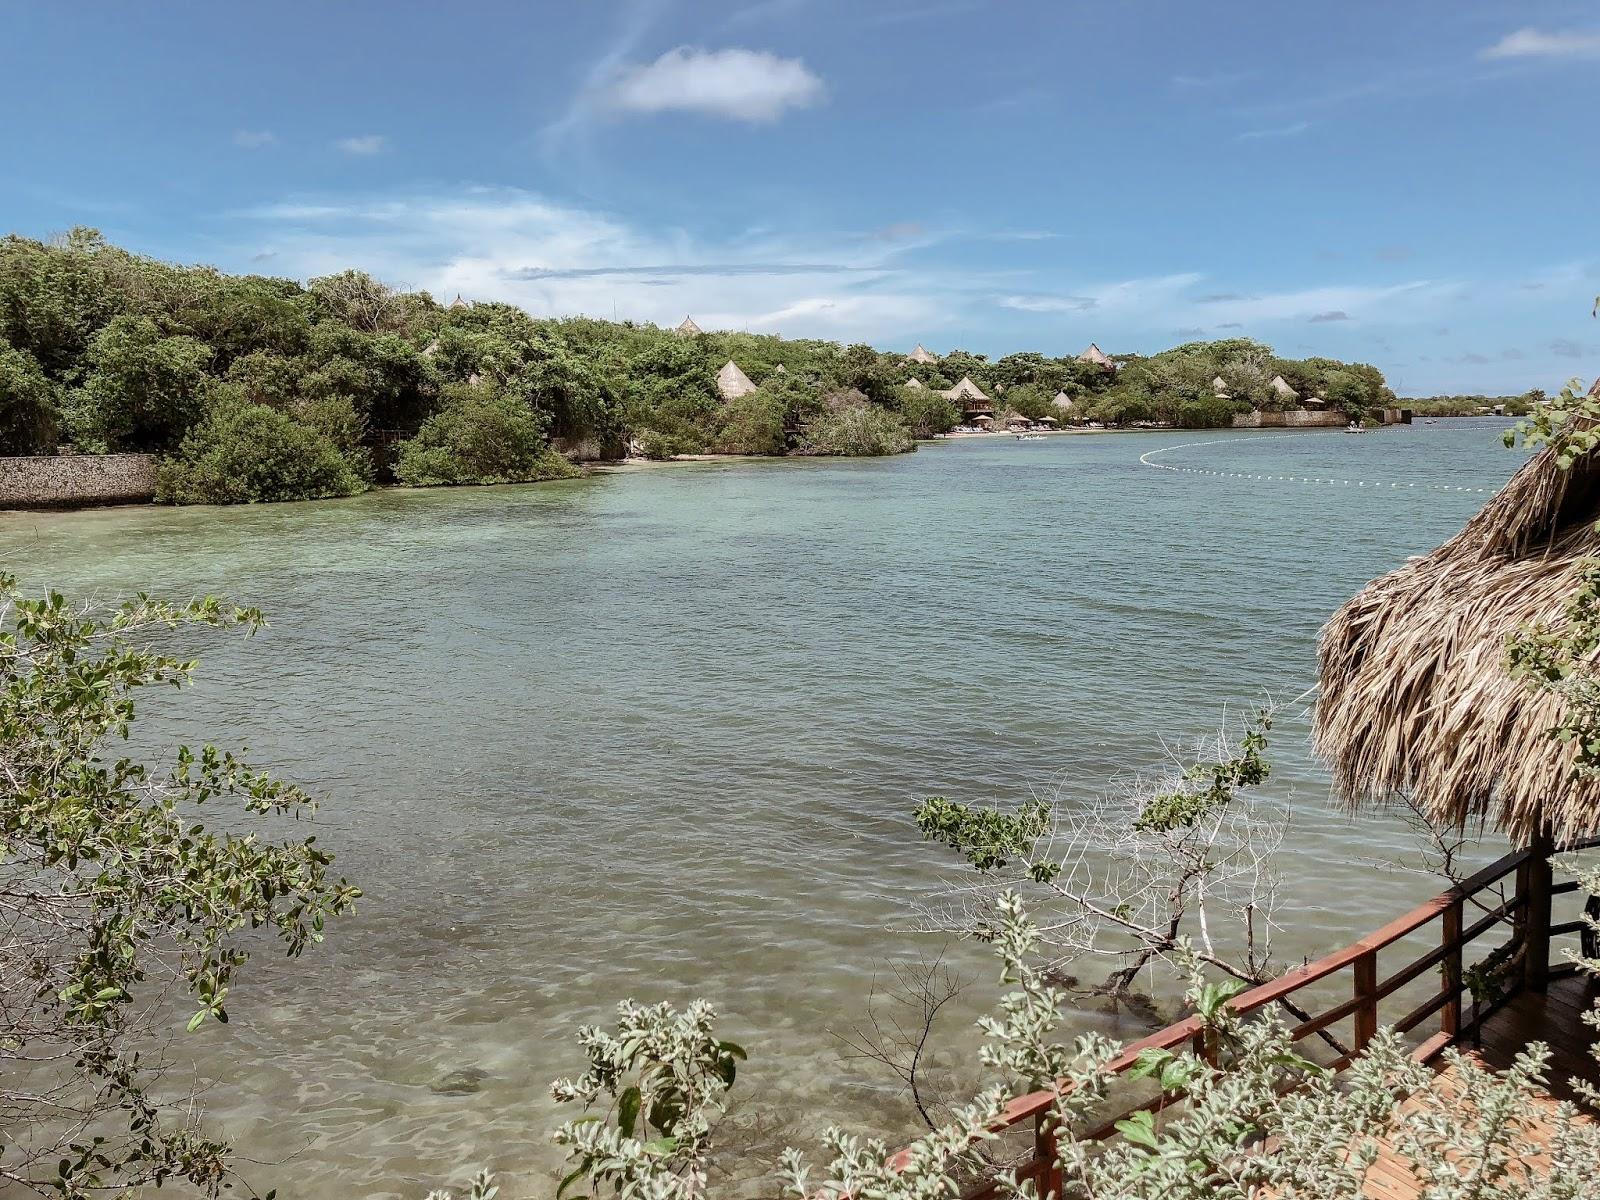 el-blog-de-silvia-rodriguez-lifestyle-travel-cartagena-de-indias-colombia-blogger-influencer